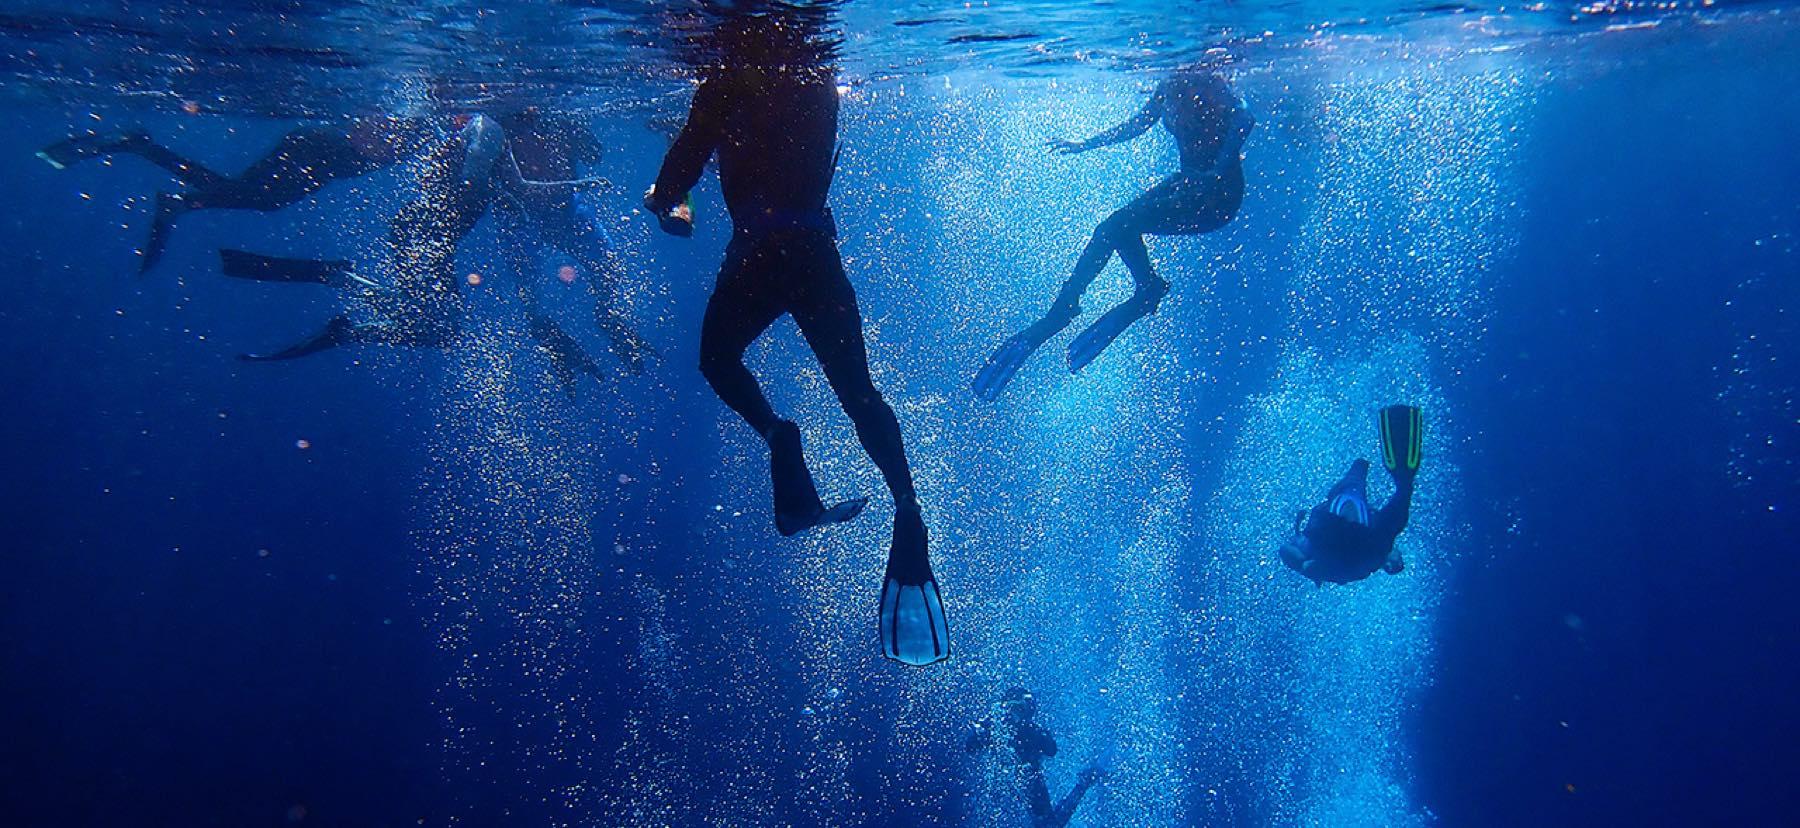 Underwater shot of students snorkeling